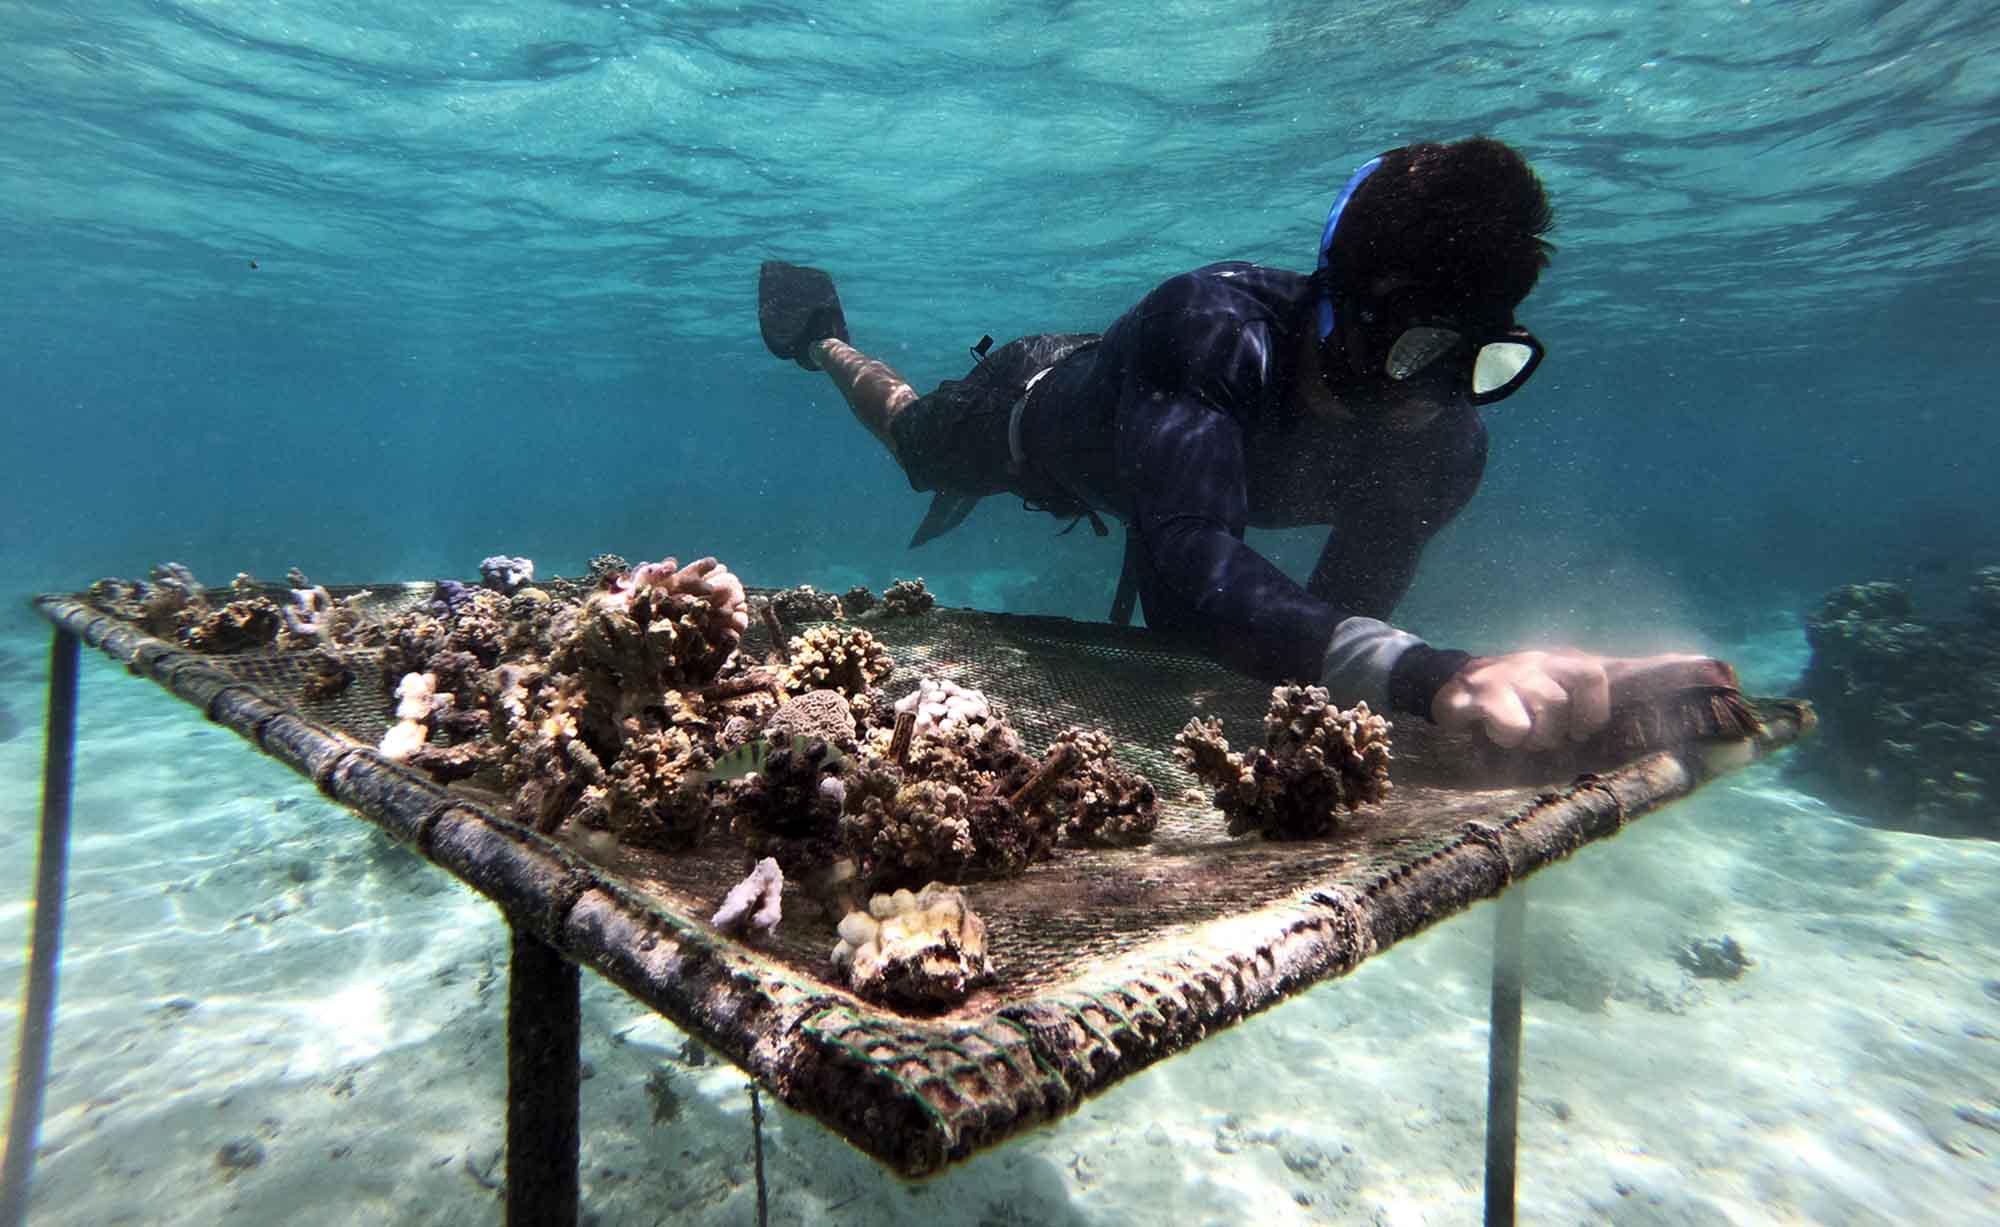 Ecotours Environment sustainable tourism Marine Wildlife Tours Moorea Ocean Adventures